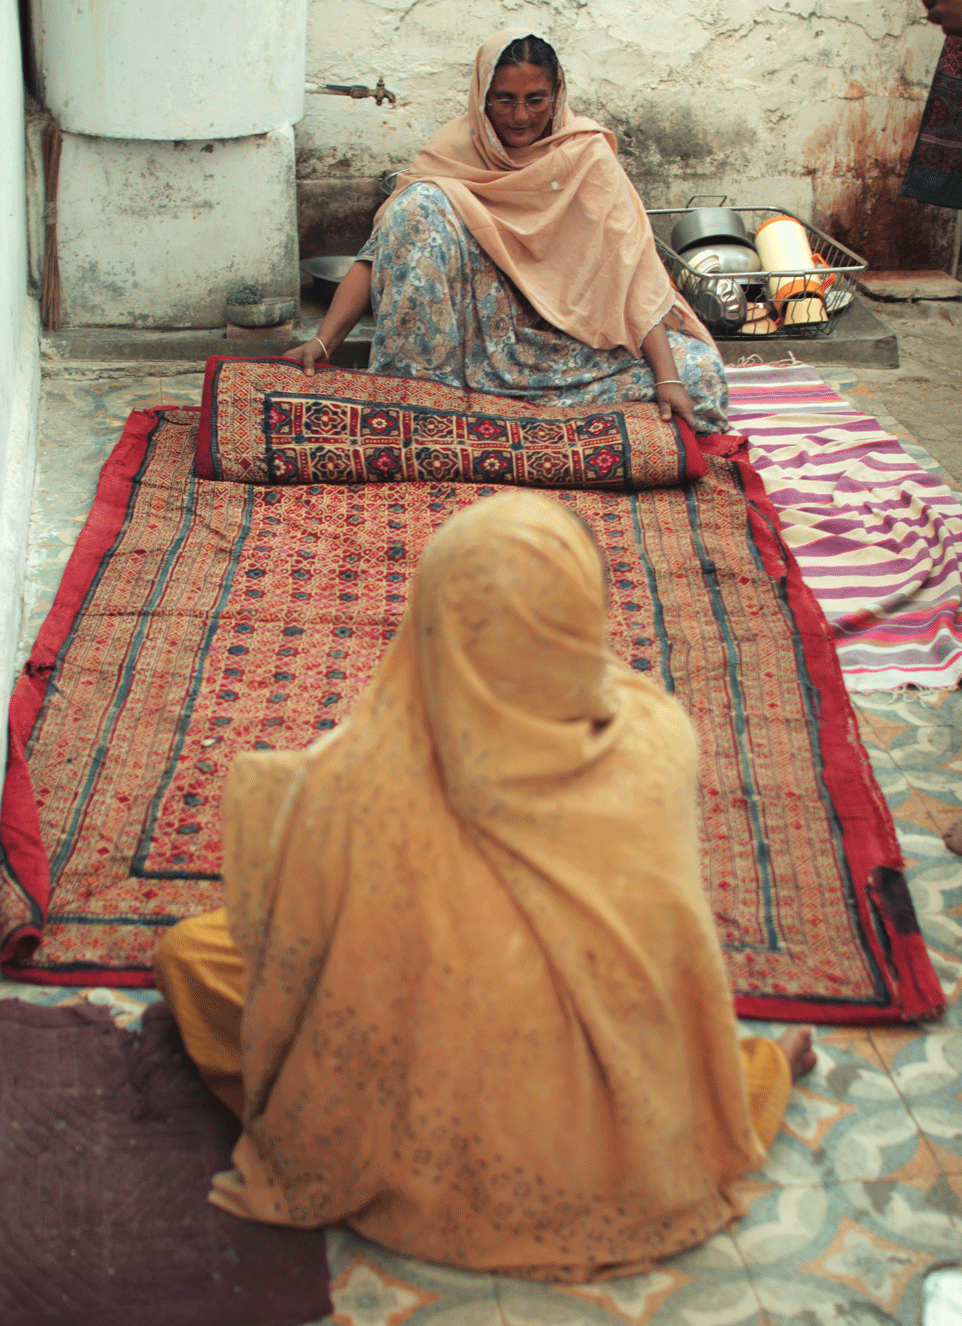 Women display their traditional  Sirakh piece, Dhamadka